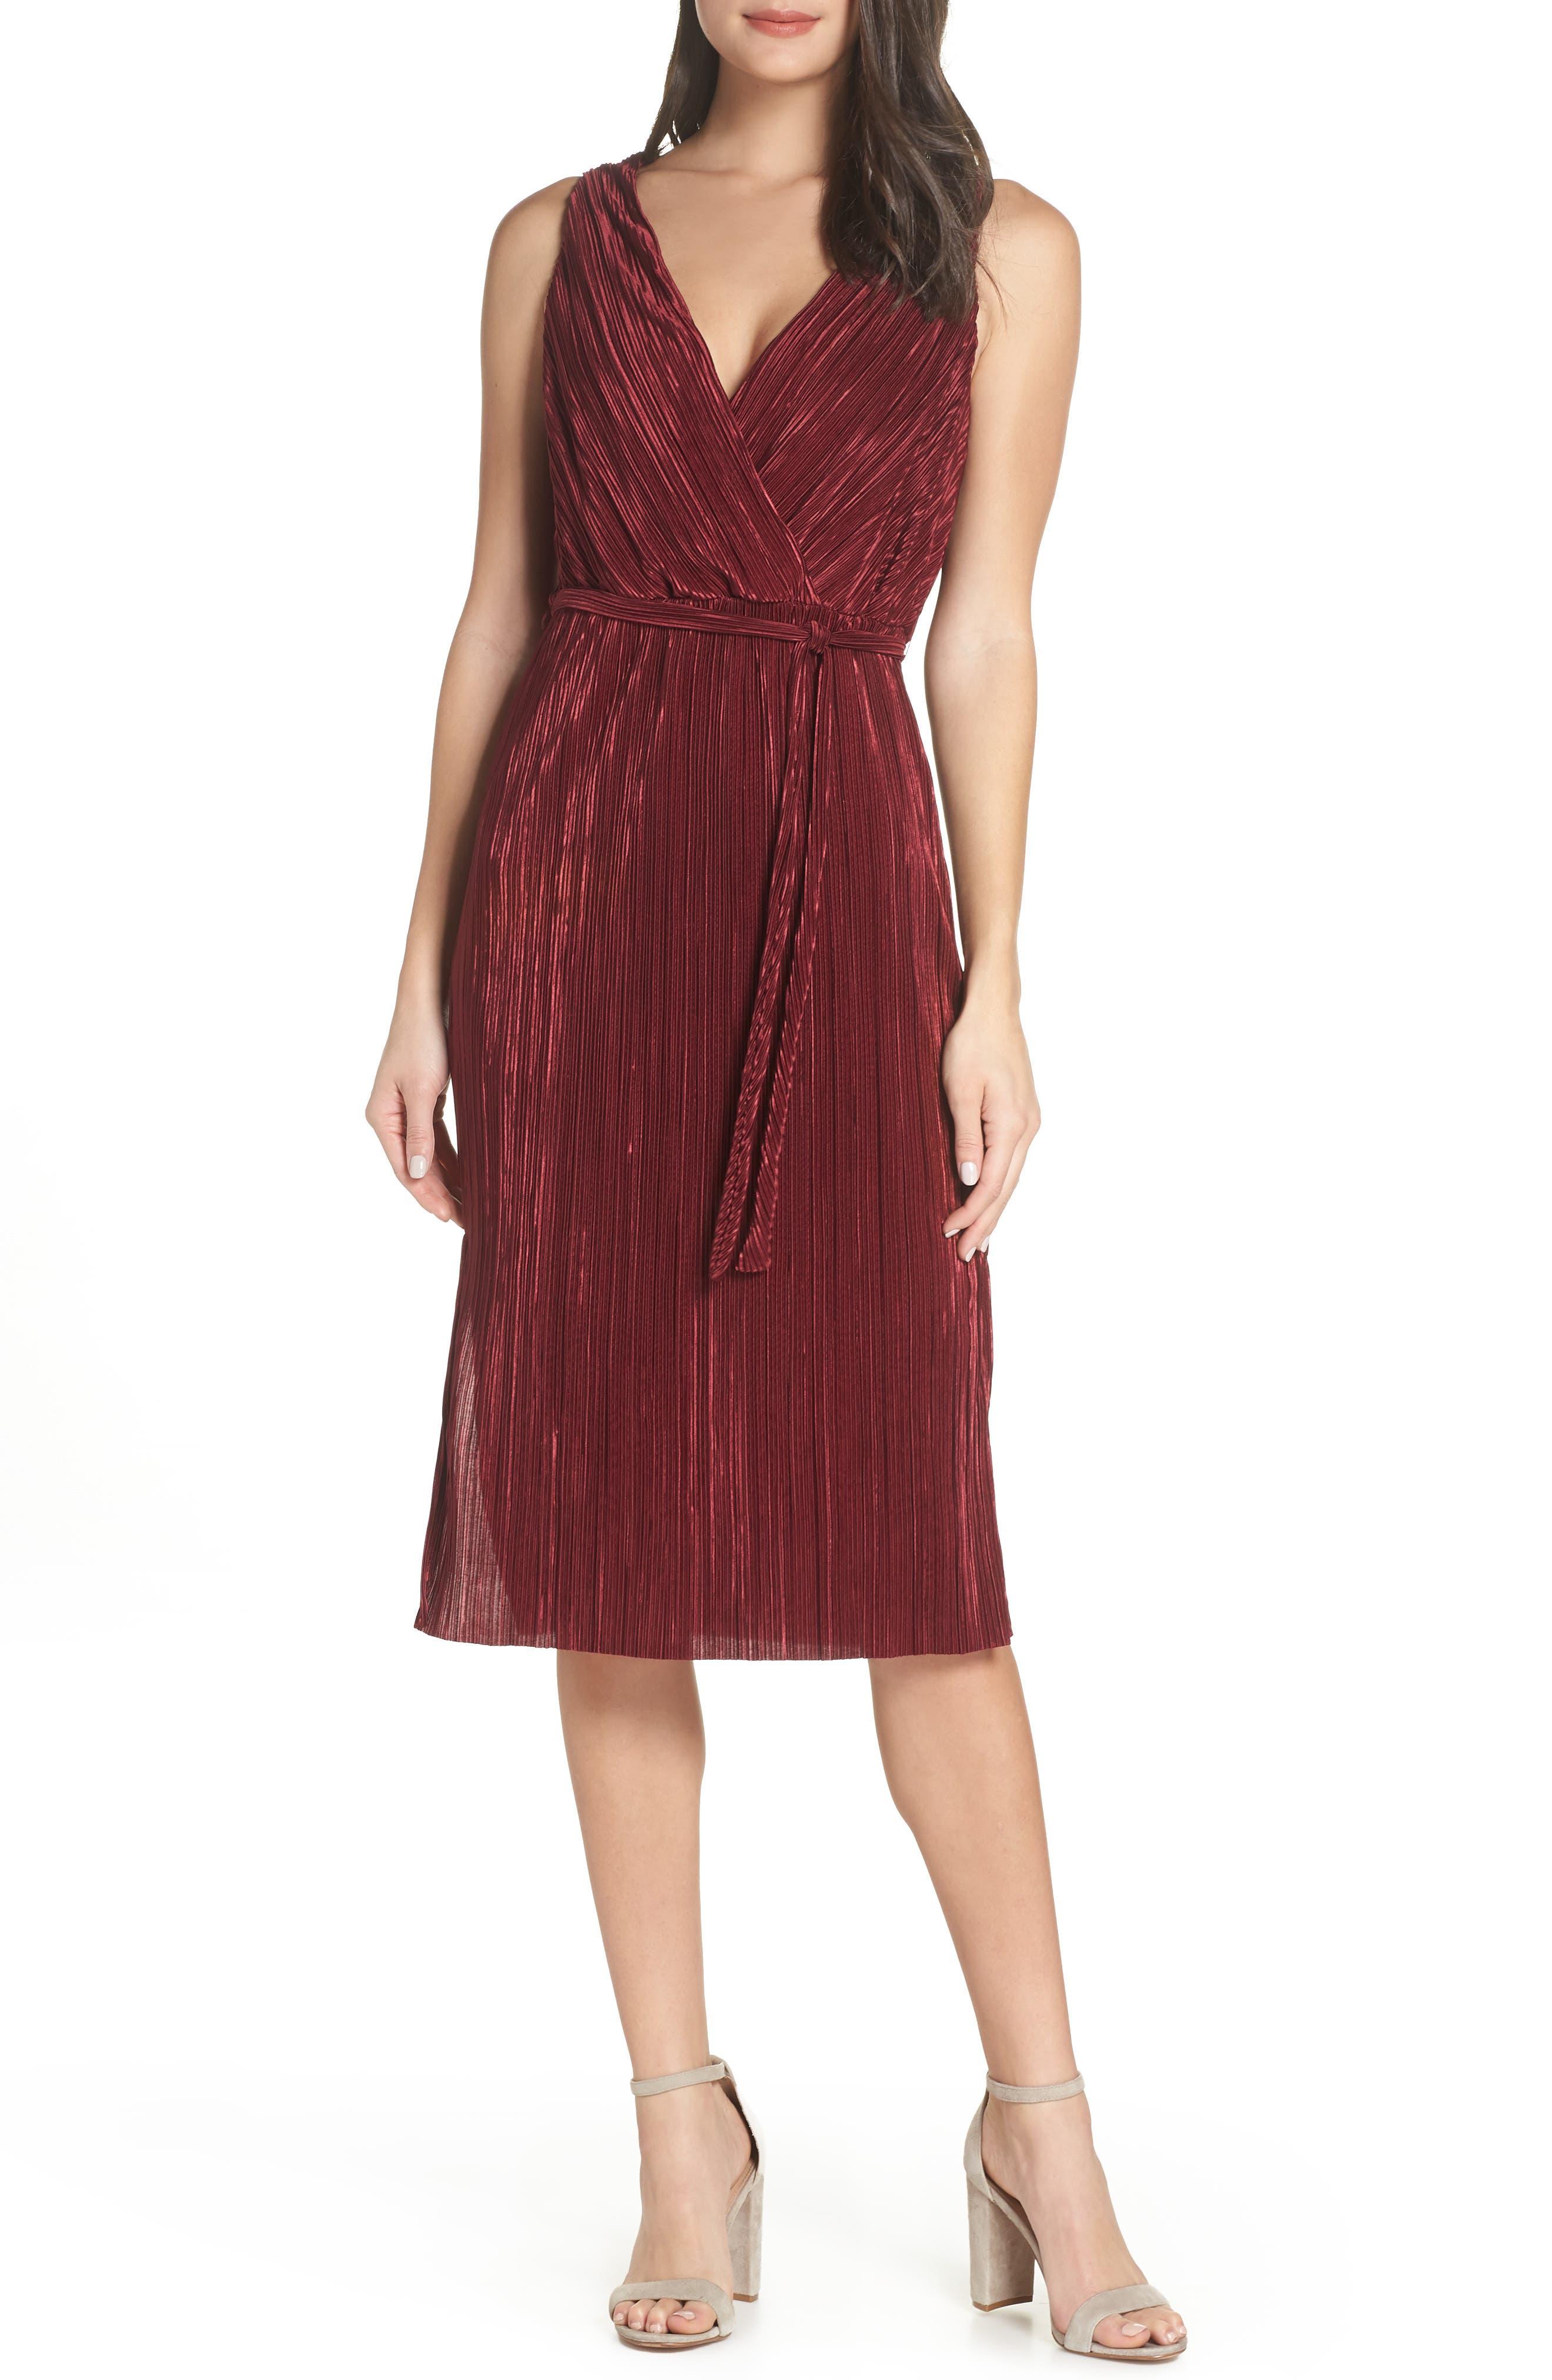 Bb Dakota Sleeveless Pleated Dress, Burgundy